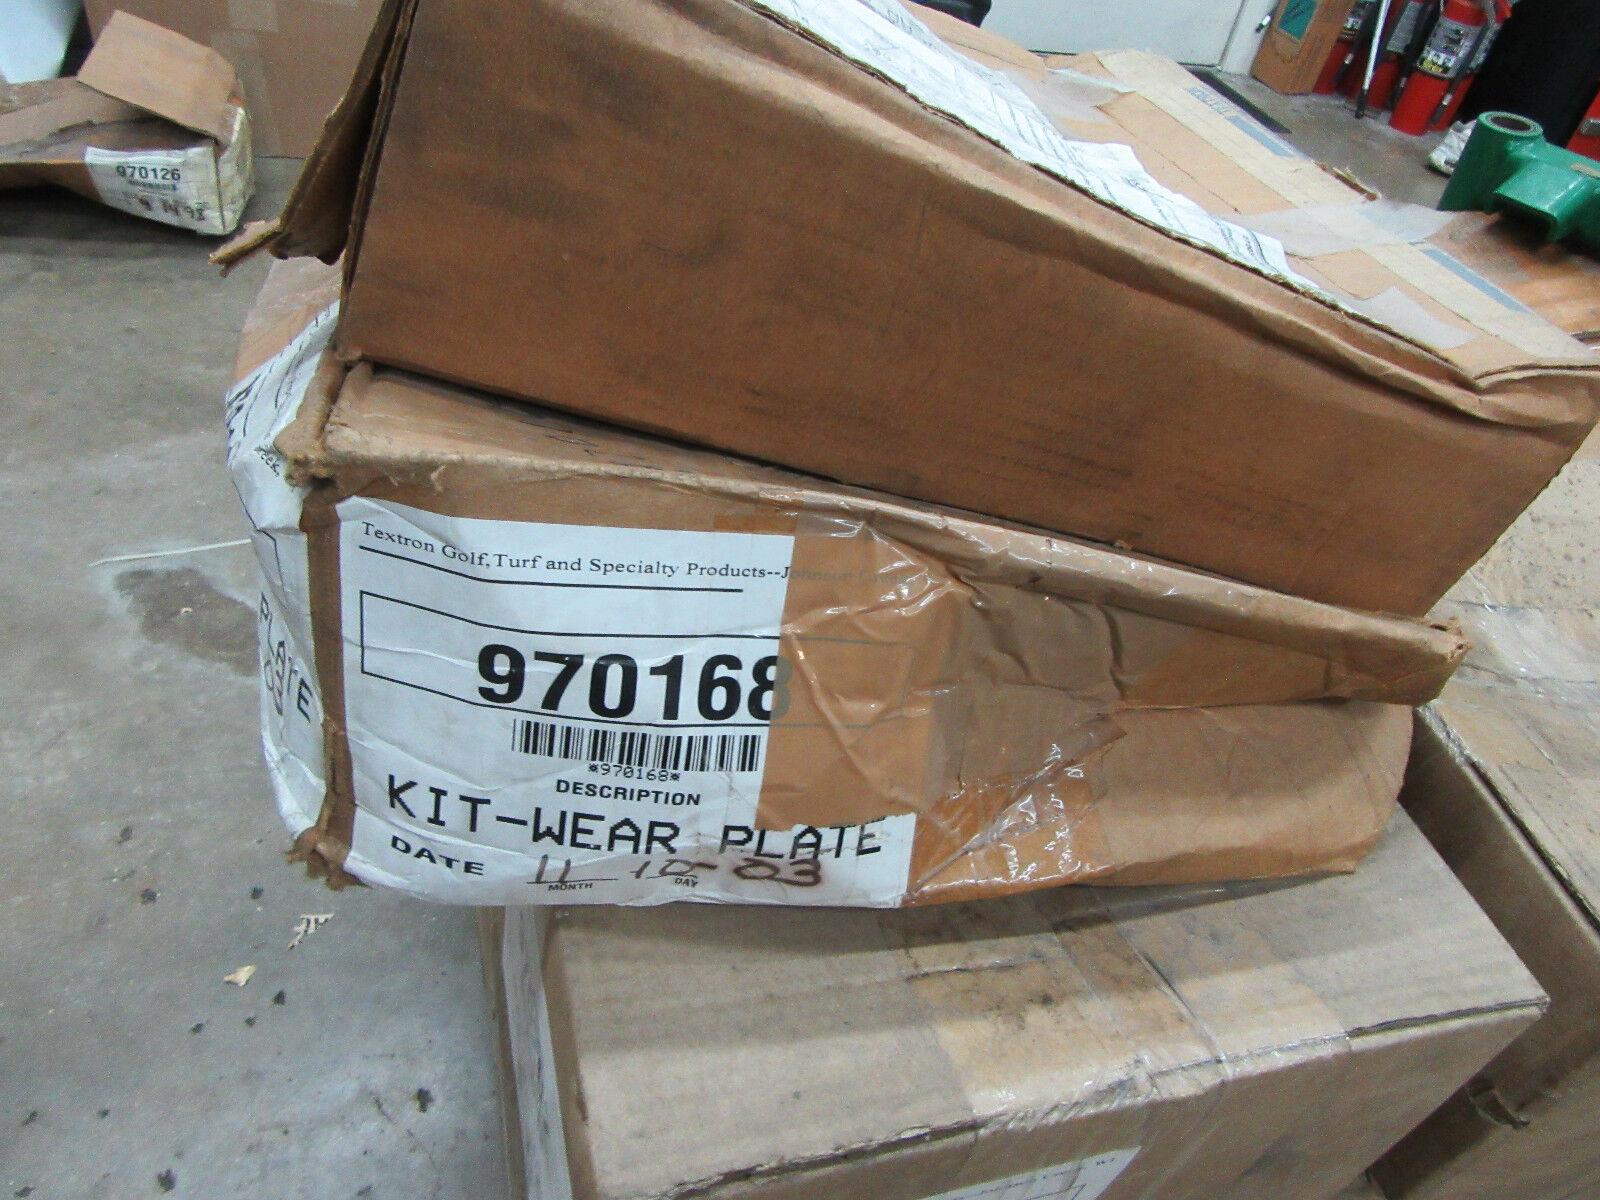 Ransomes 5 Deck Rotary Mower AR 250 Jacobsen AR 2500 Kit Wear Plate # 970168